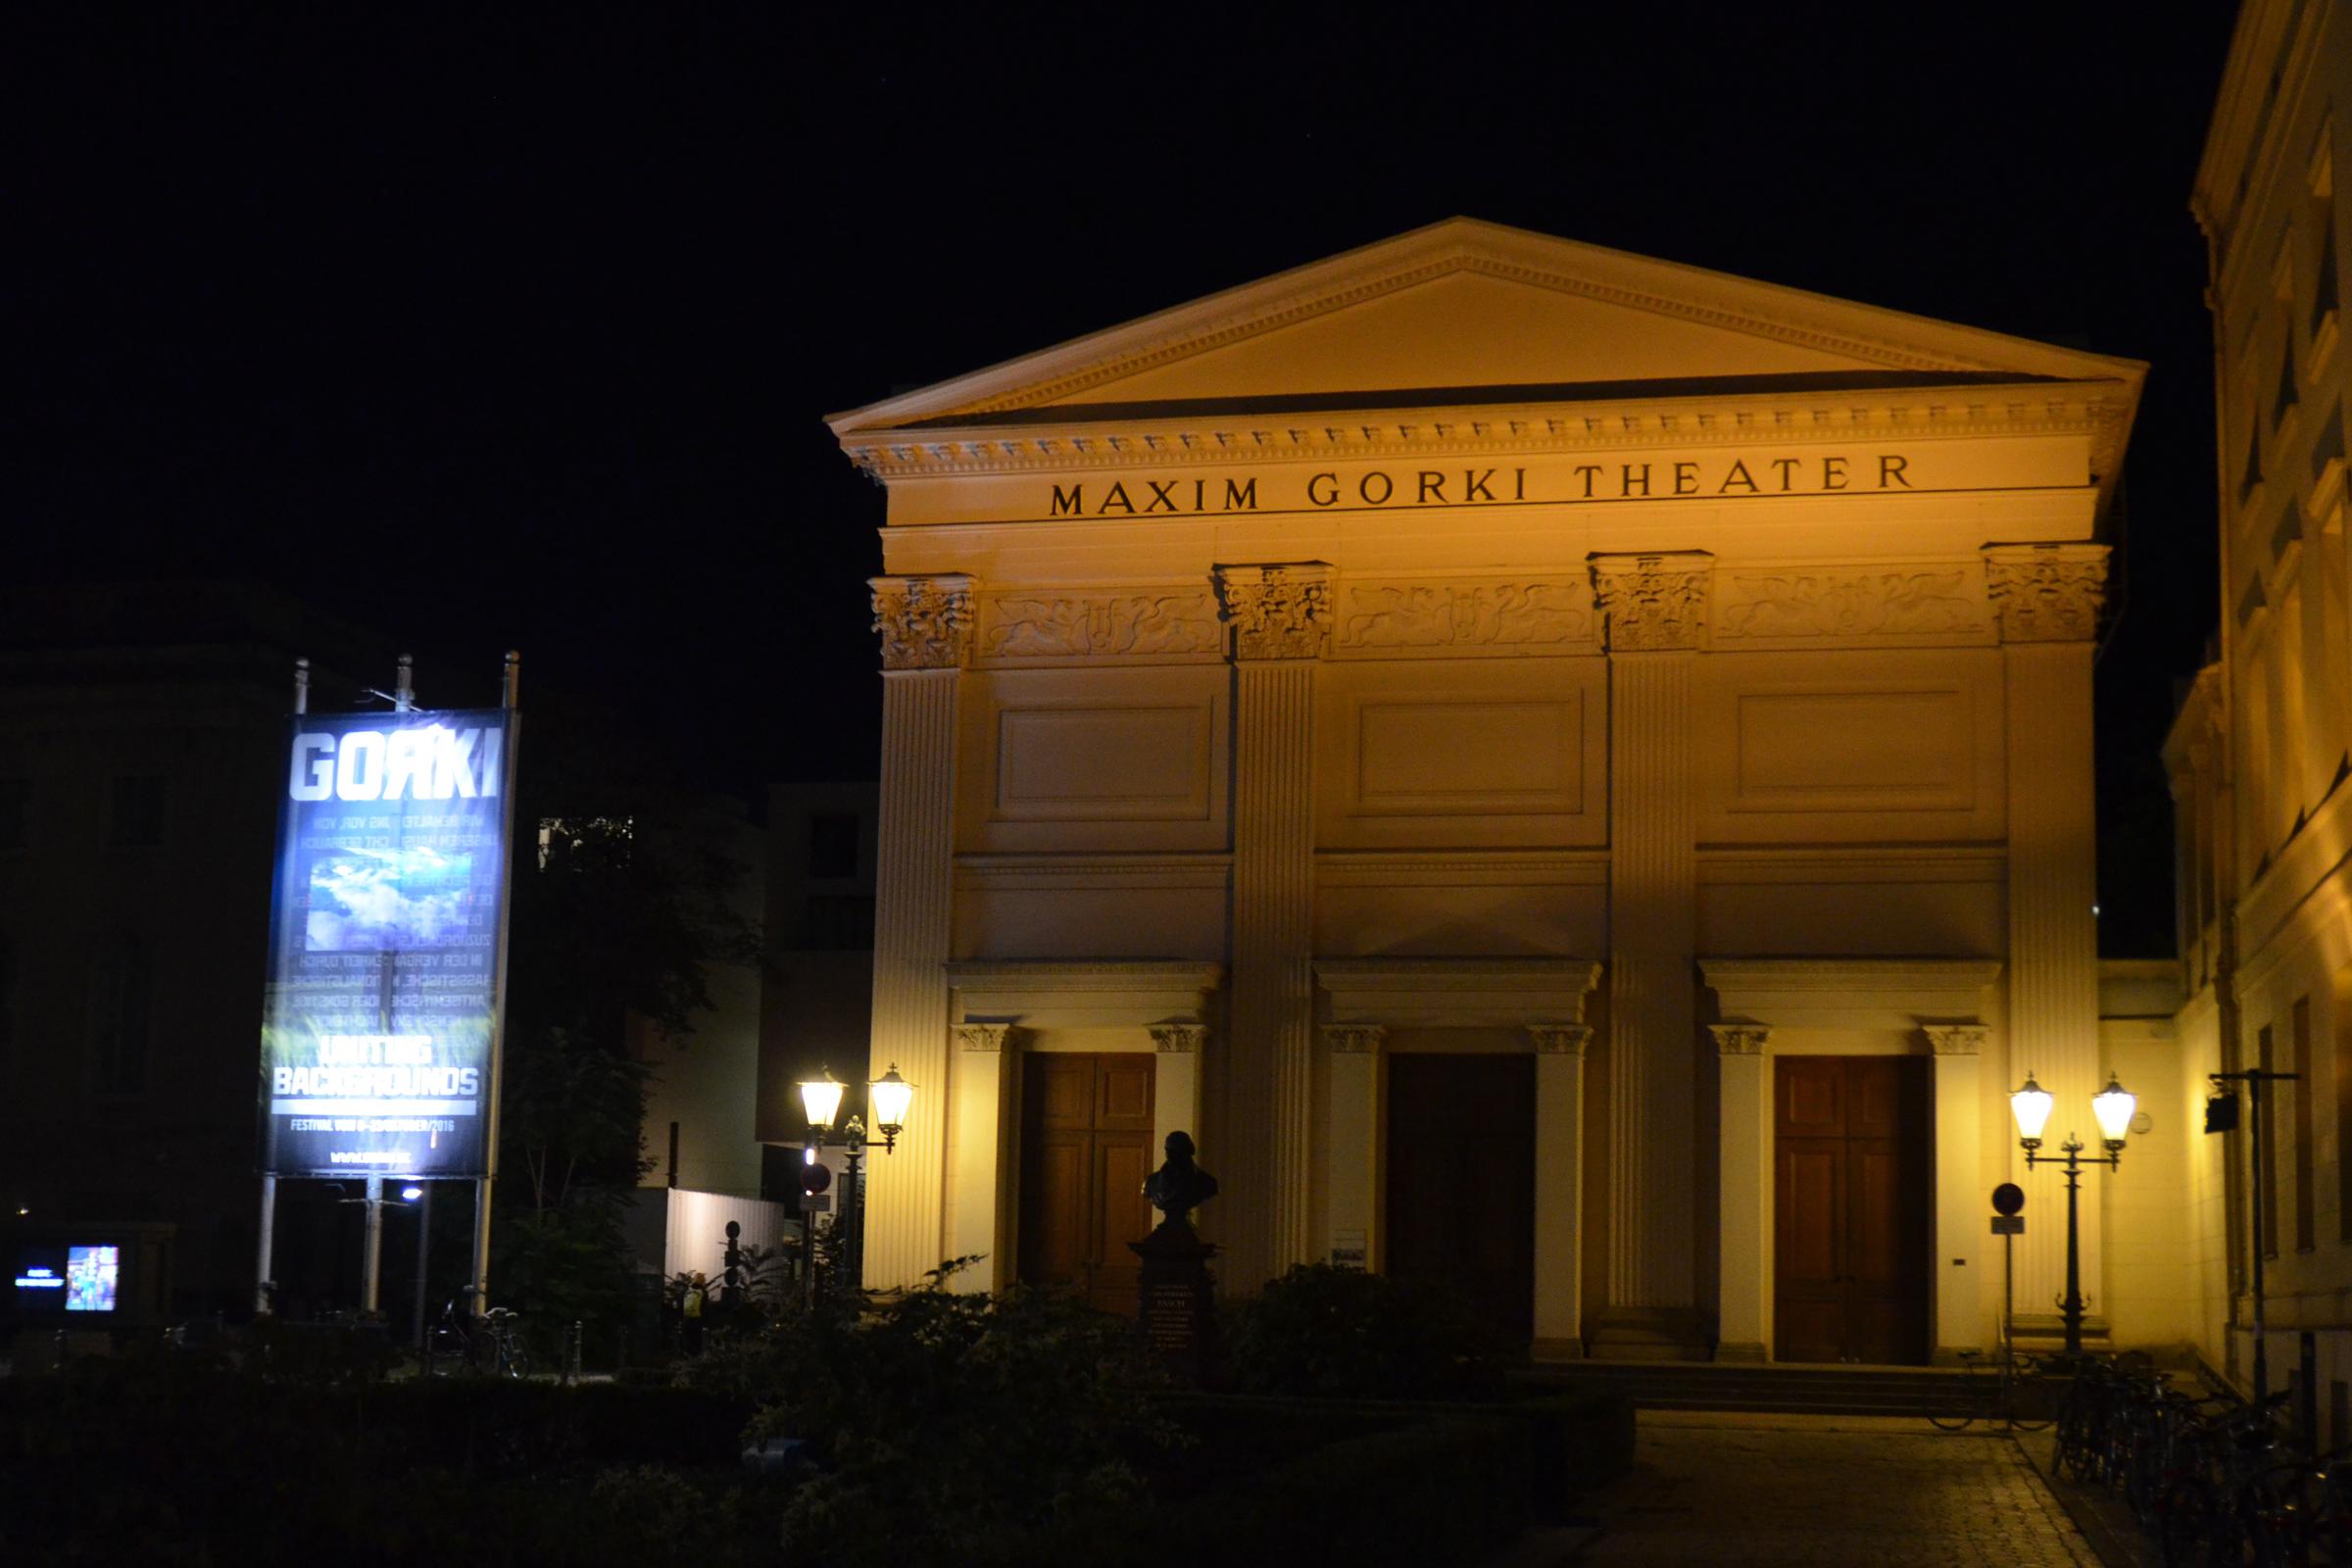 Gorki-Theater am Abend. Foto: Ulrich Horb